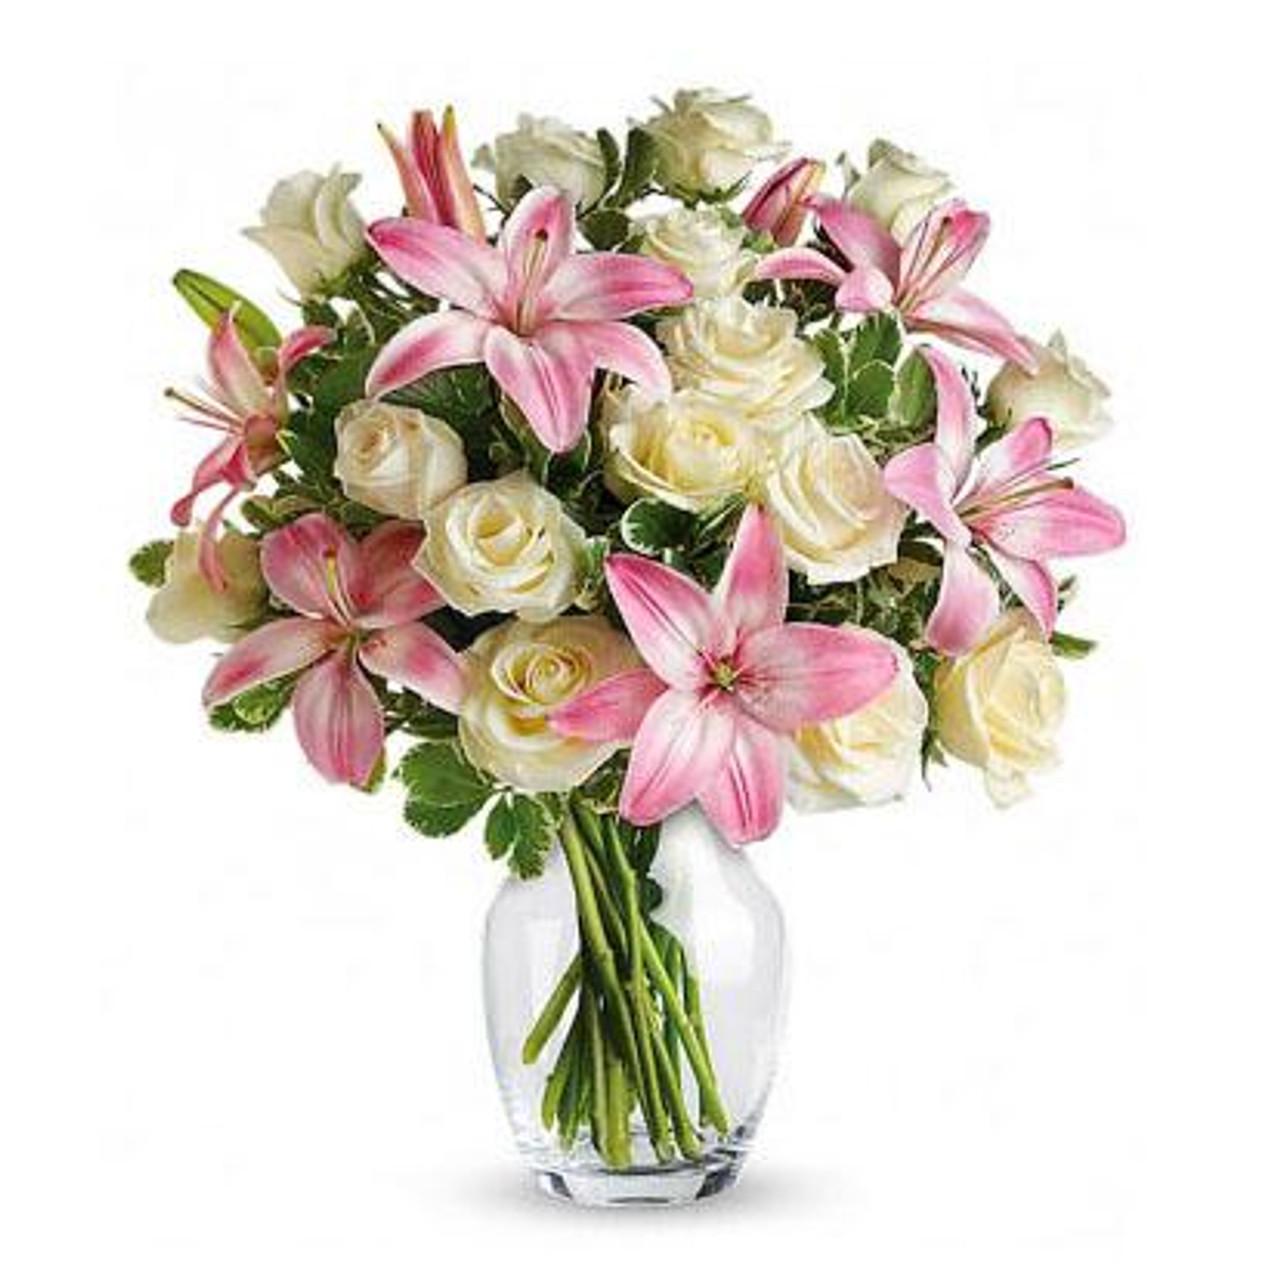 White Roses & Stargazer Lilies Bouquet